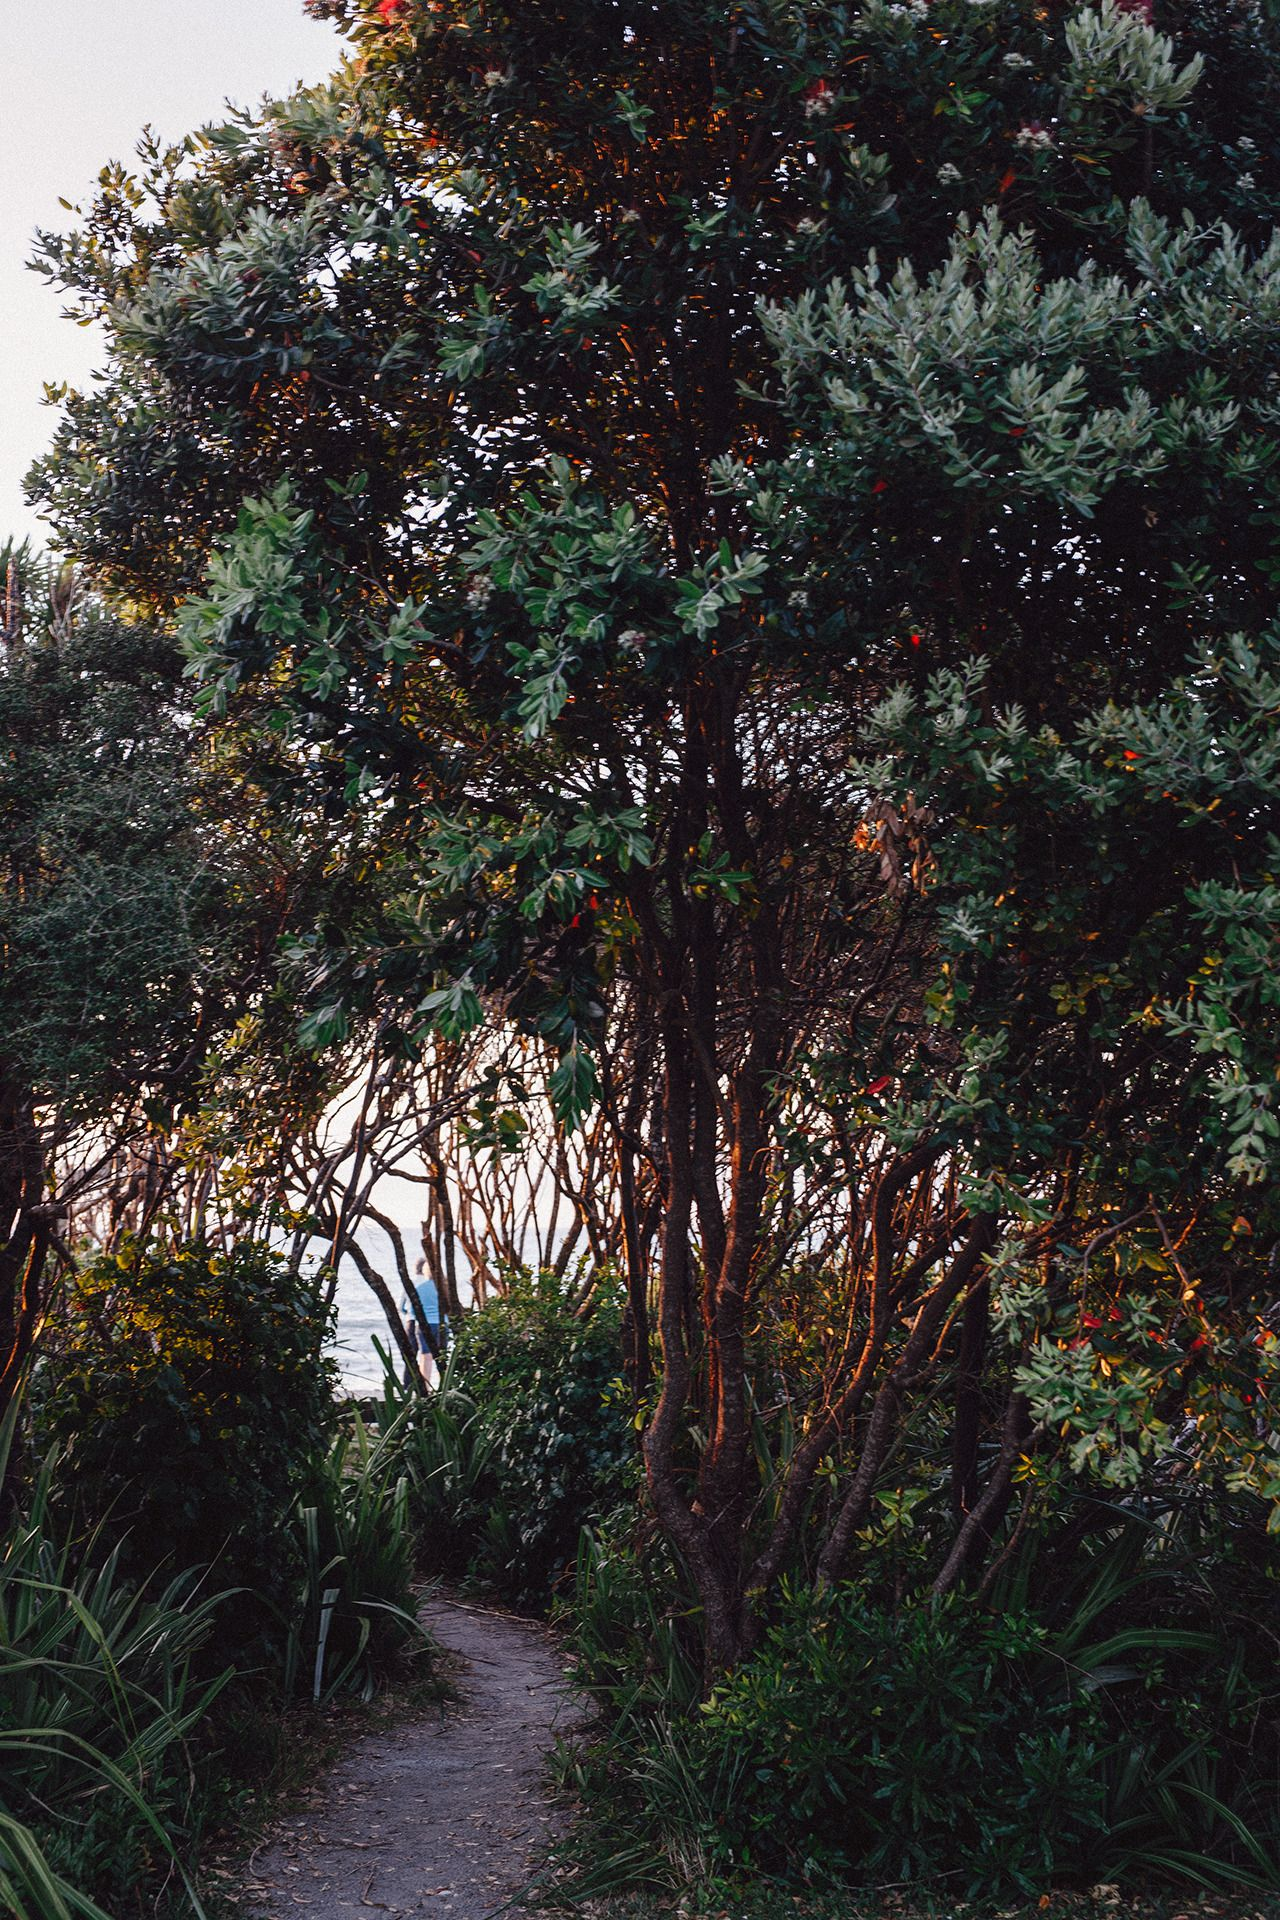 Enchanted walk to the beach…we slept only 100 m away from the oceanat punakaiki beach ... - #fotografie #neuseeland #new #on #pancake #photographers #punakaiki #roadtrip #rocks #Tumblr #vanlife #zealand